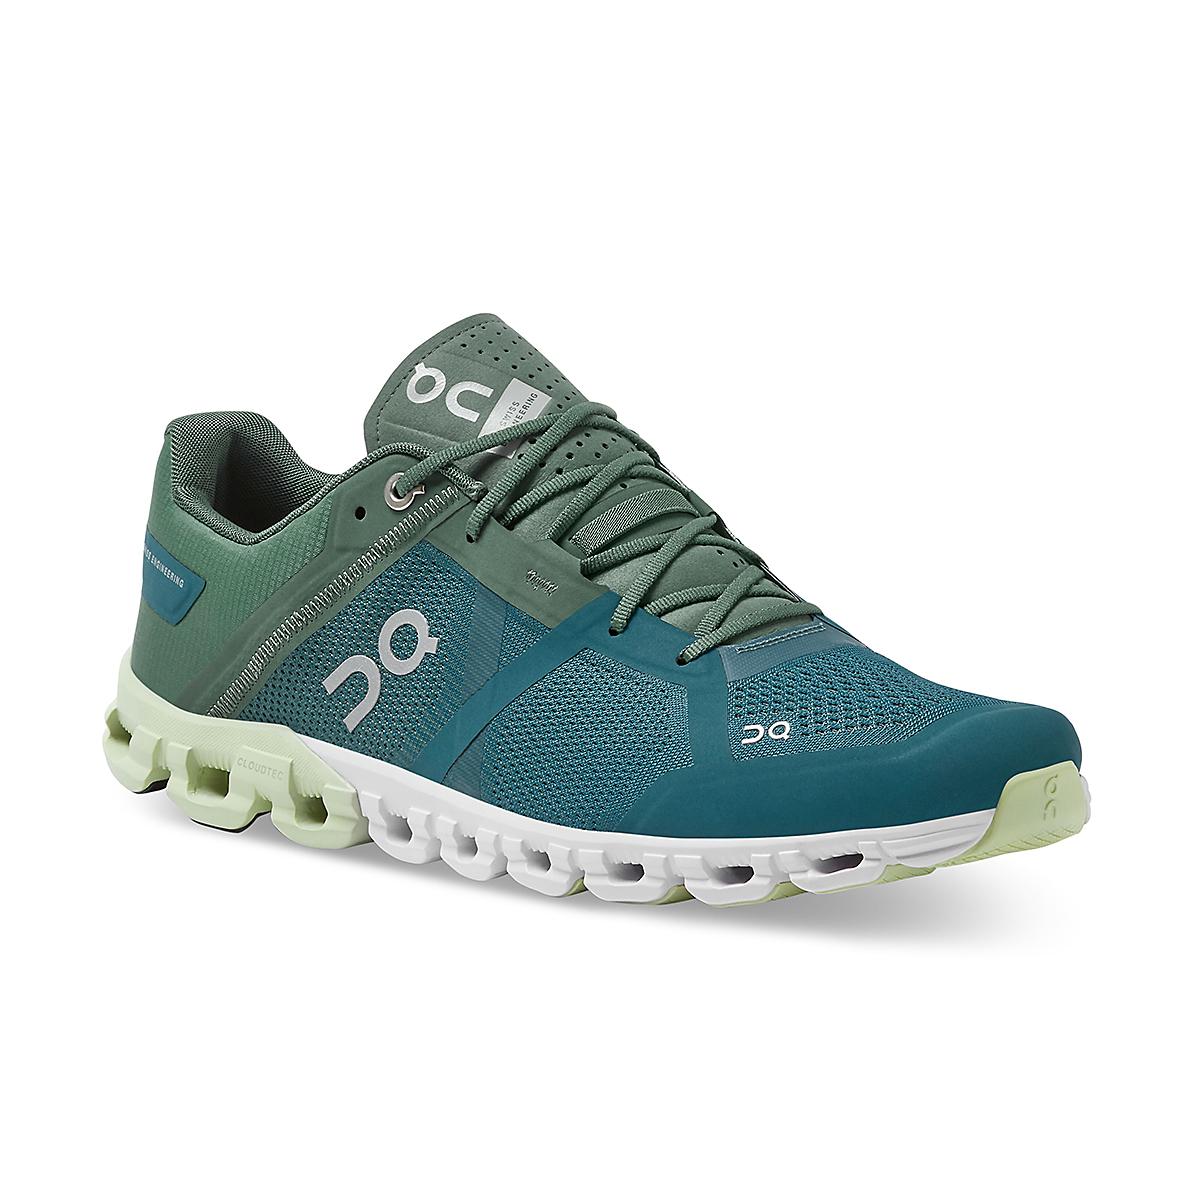 Men's On Cloudflow 2.0 Running Shoe - Color: Sea/Petrol - Size: 7 - Width: Regular, Sea/Petrol, large, image 2